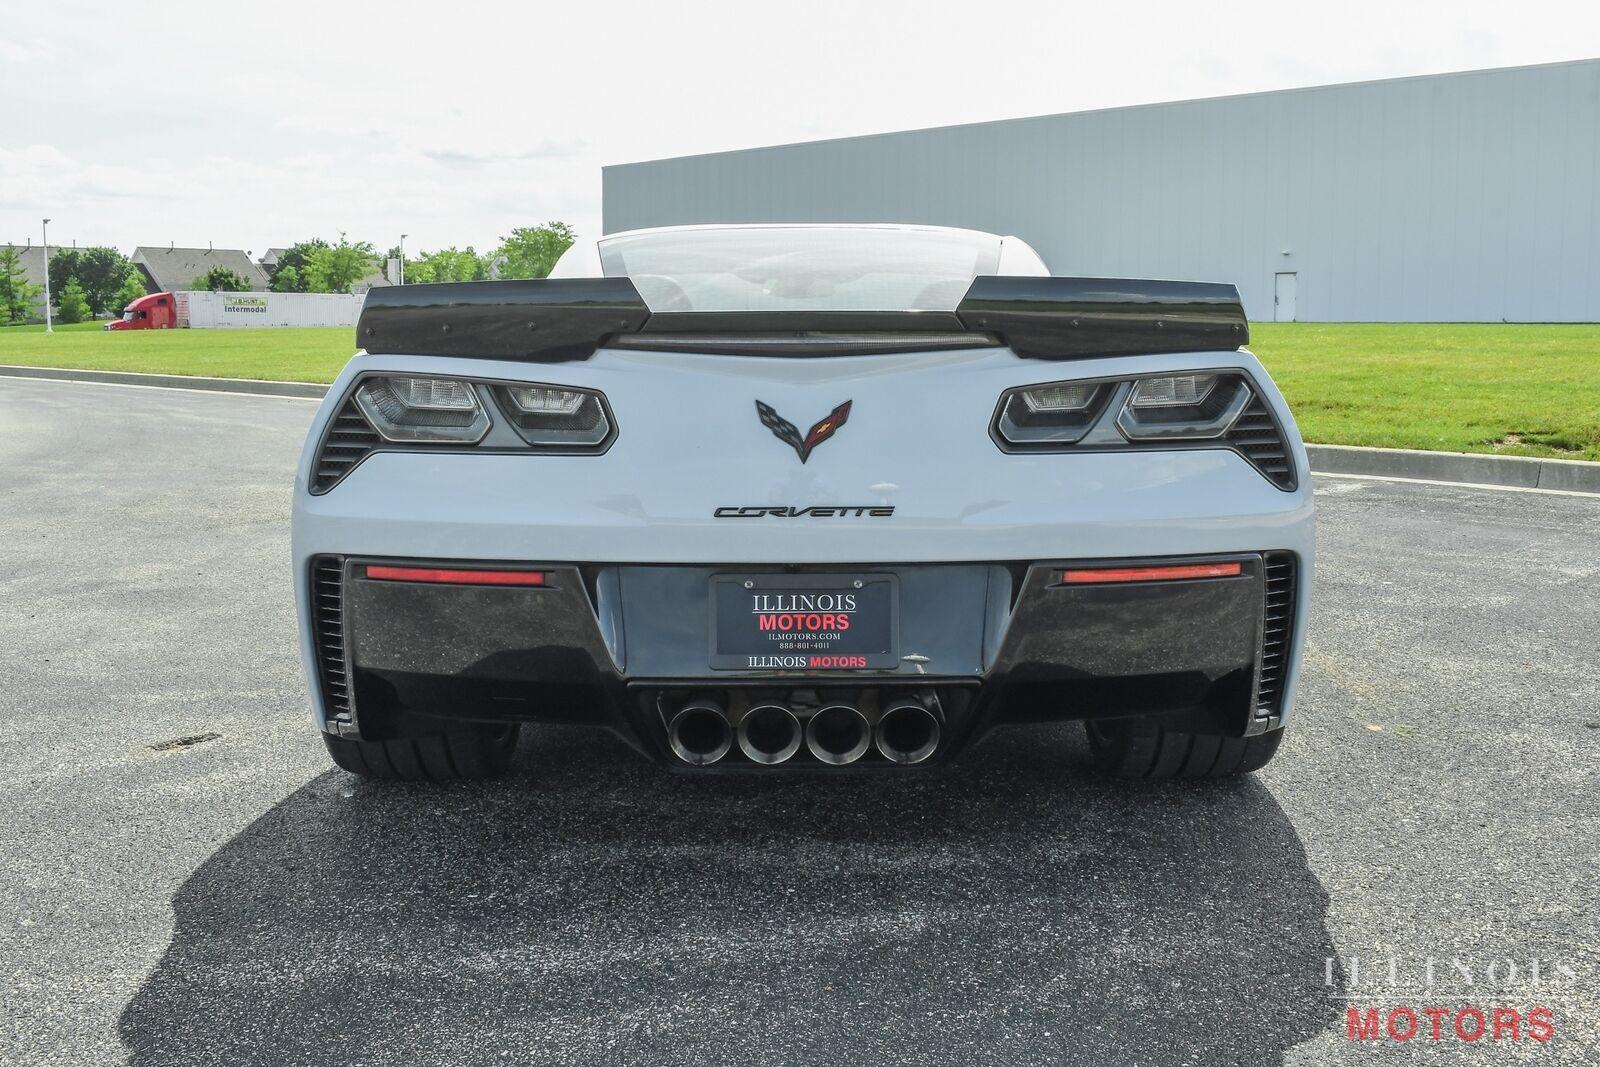 2019 Gray Chevrolet Corvette Z06  | C7 Corvette Photo 5